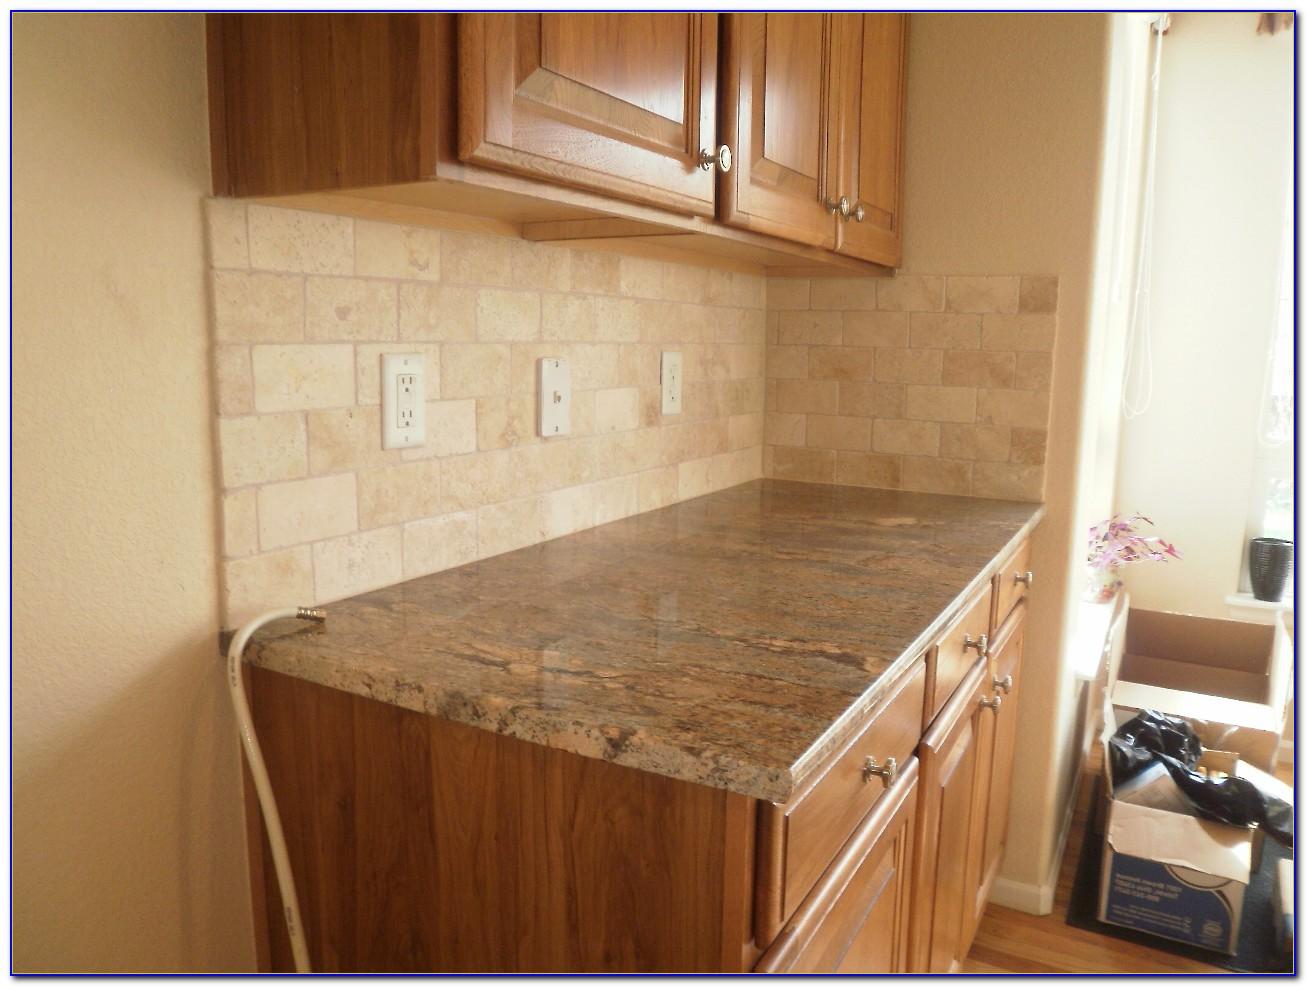 3 215 6 Travertine Subway Tile Backsplash Tiles Home